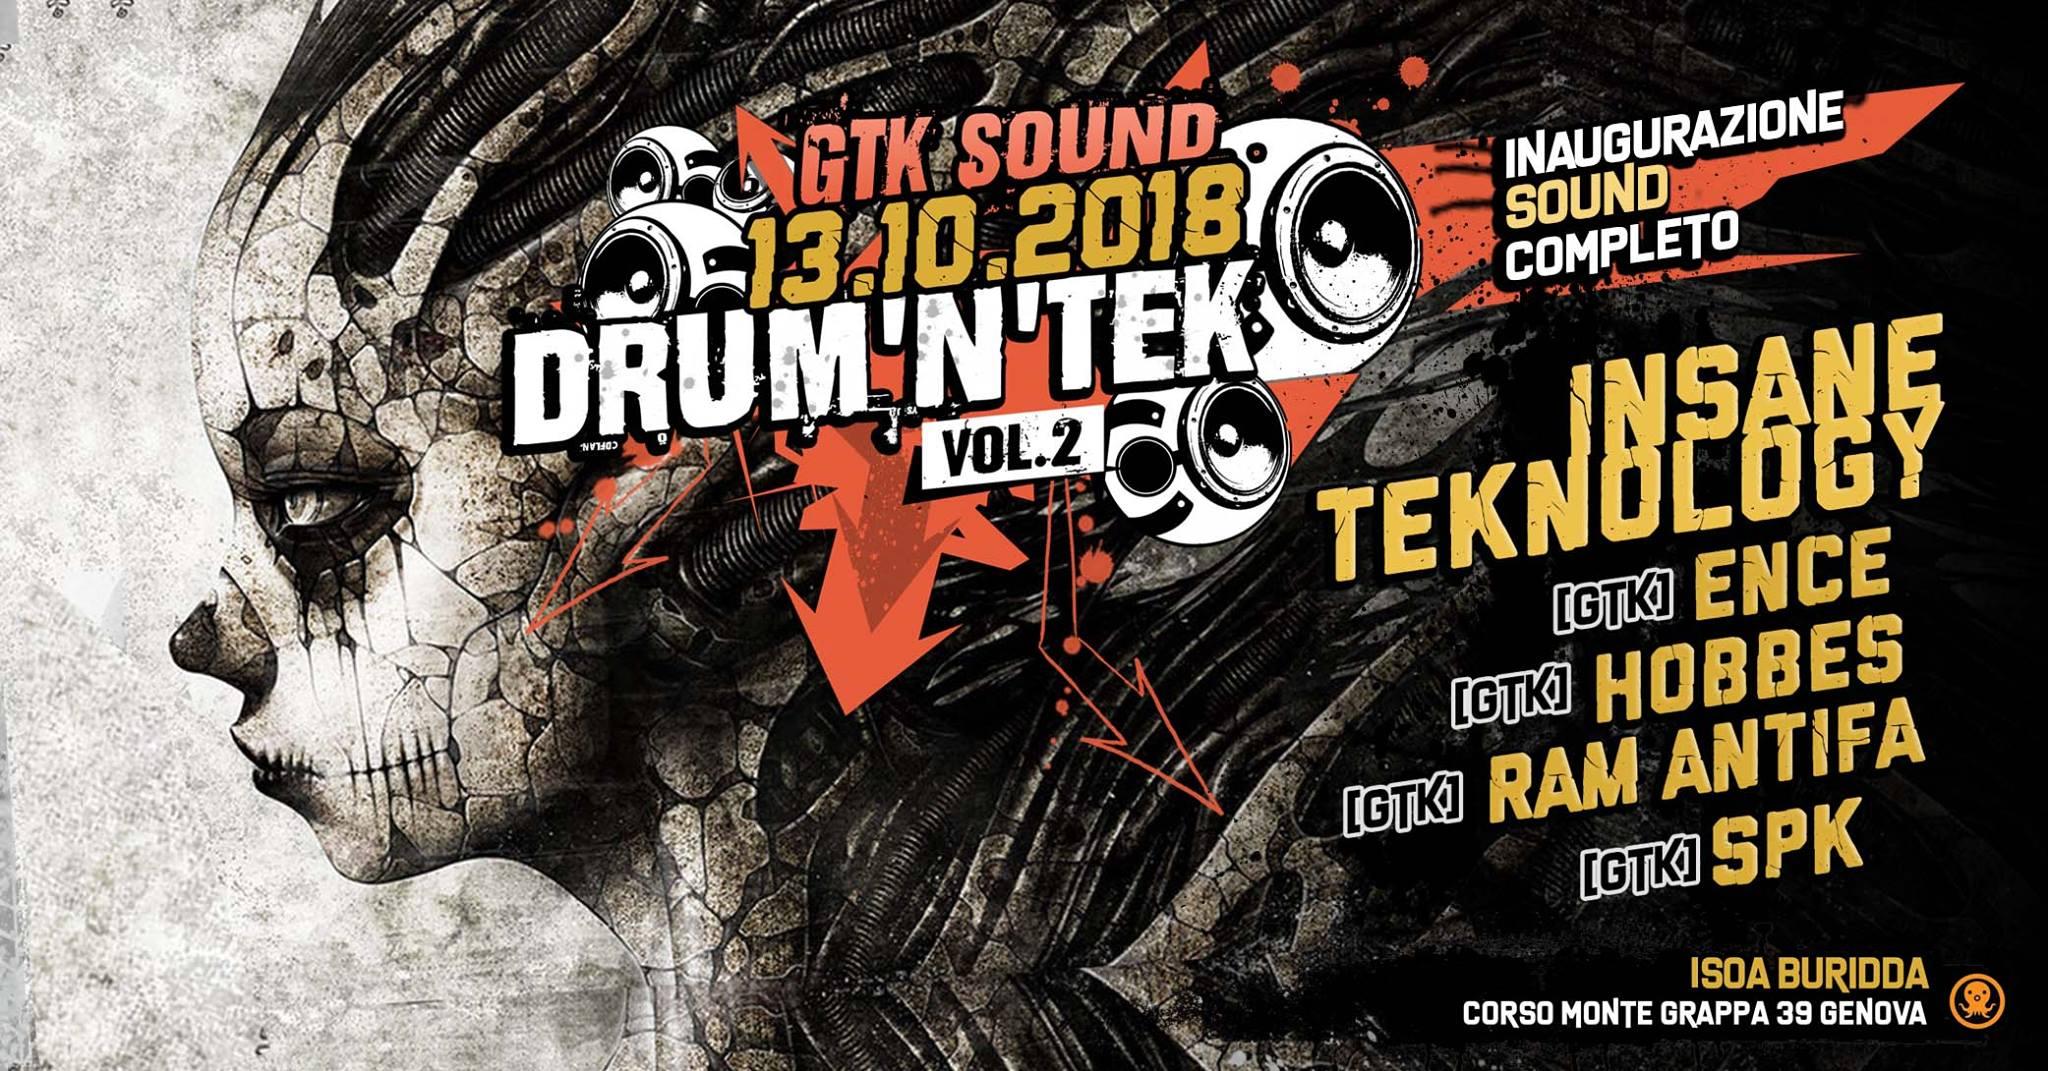 GTK Drum'n'Tek Party Vol. 2 // 13 Ottobre 2018